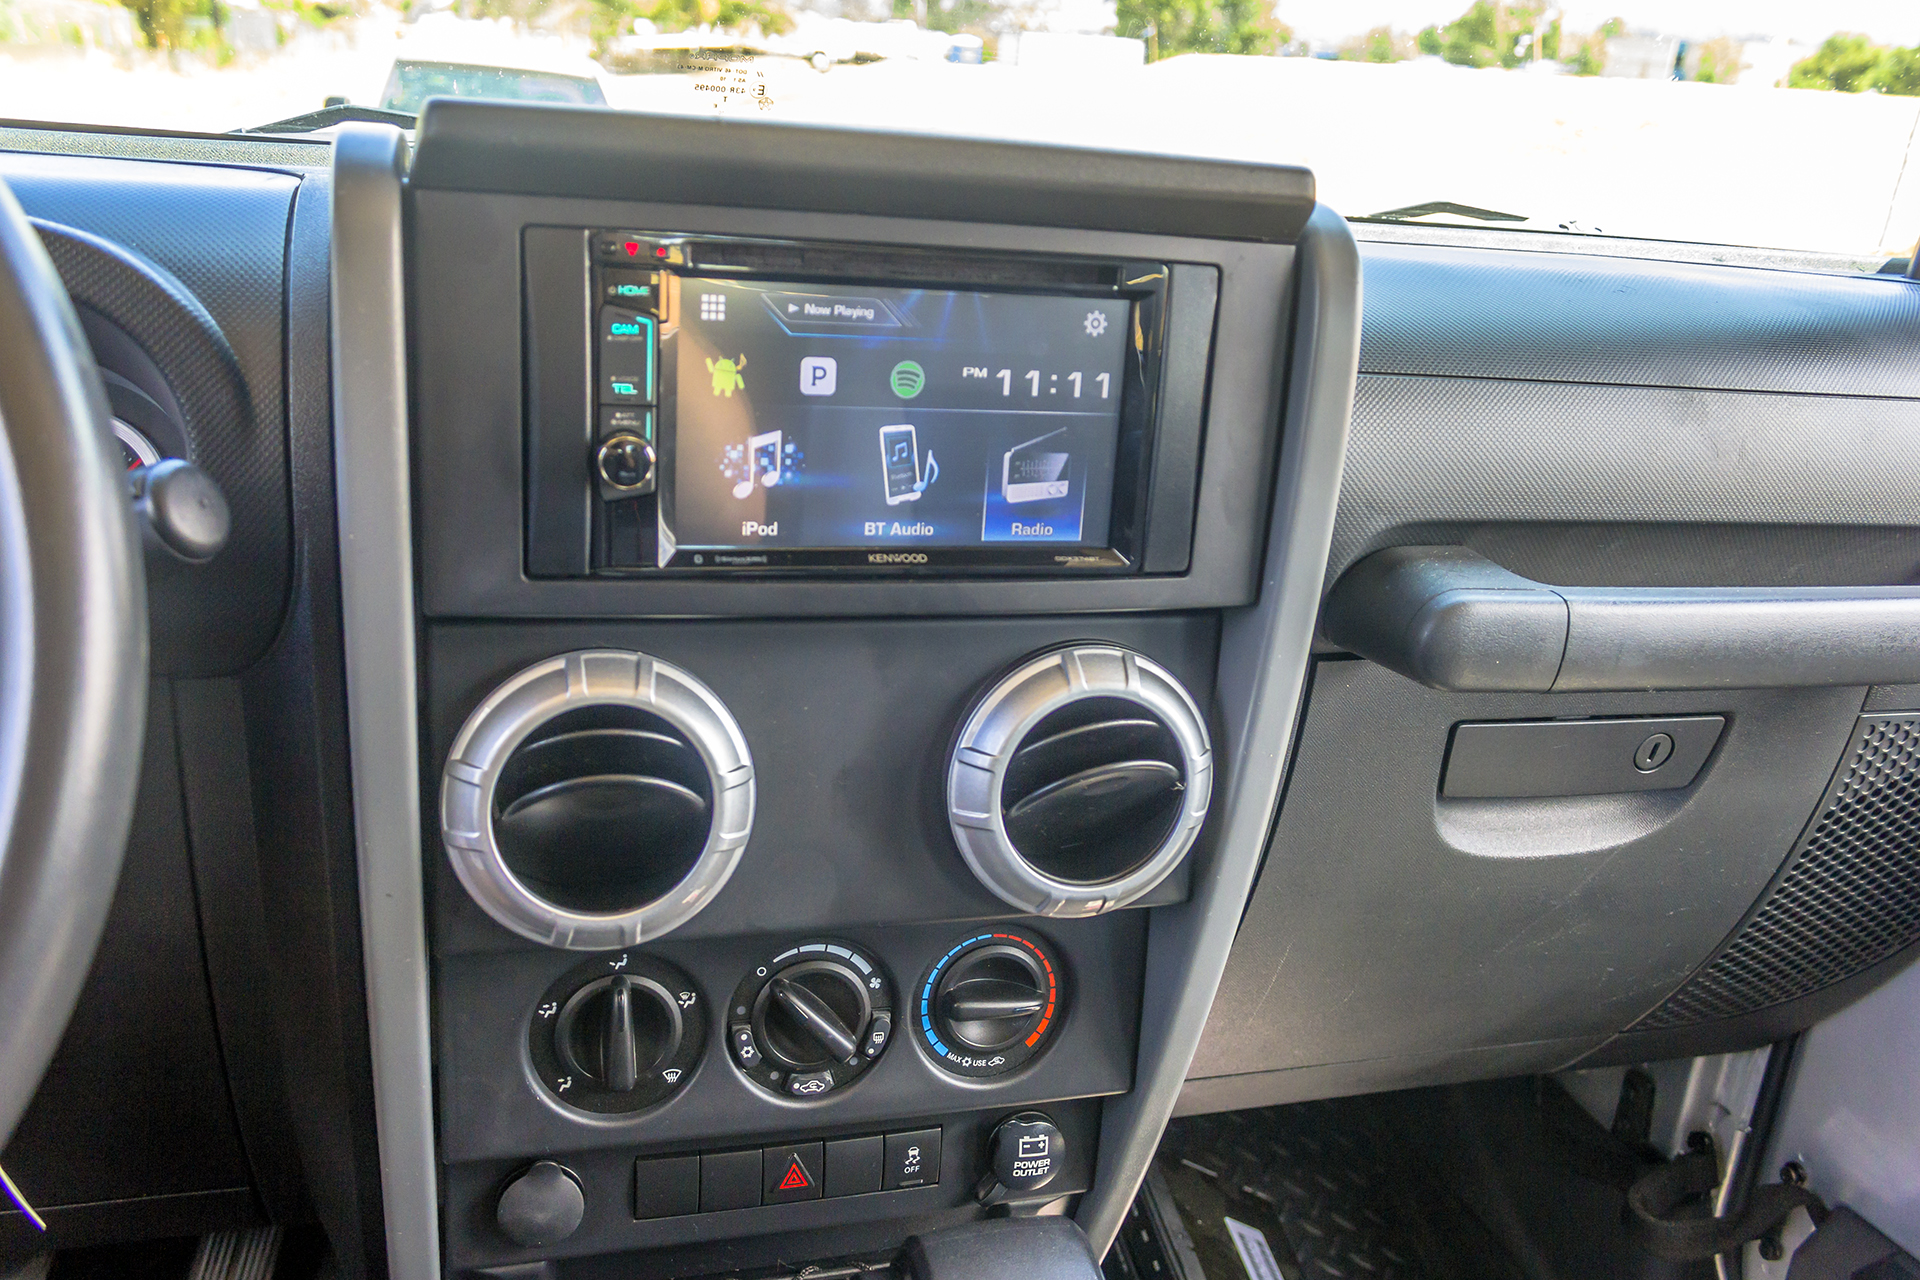 2010+Jeep+Wrangler+DDIN?format=1500w 2010 jeep wrangler ddin install twelve volt technologies 2010 jeep wrangler radio wiring harness at n-0.co